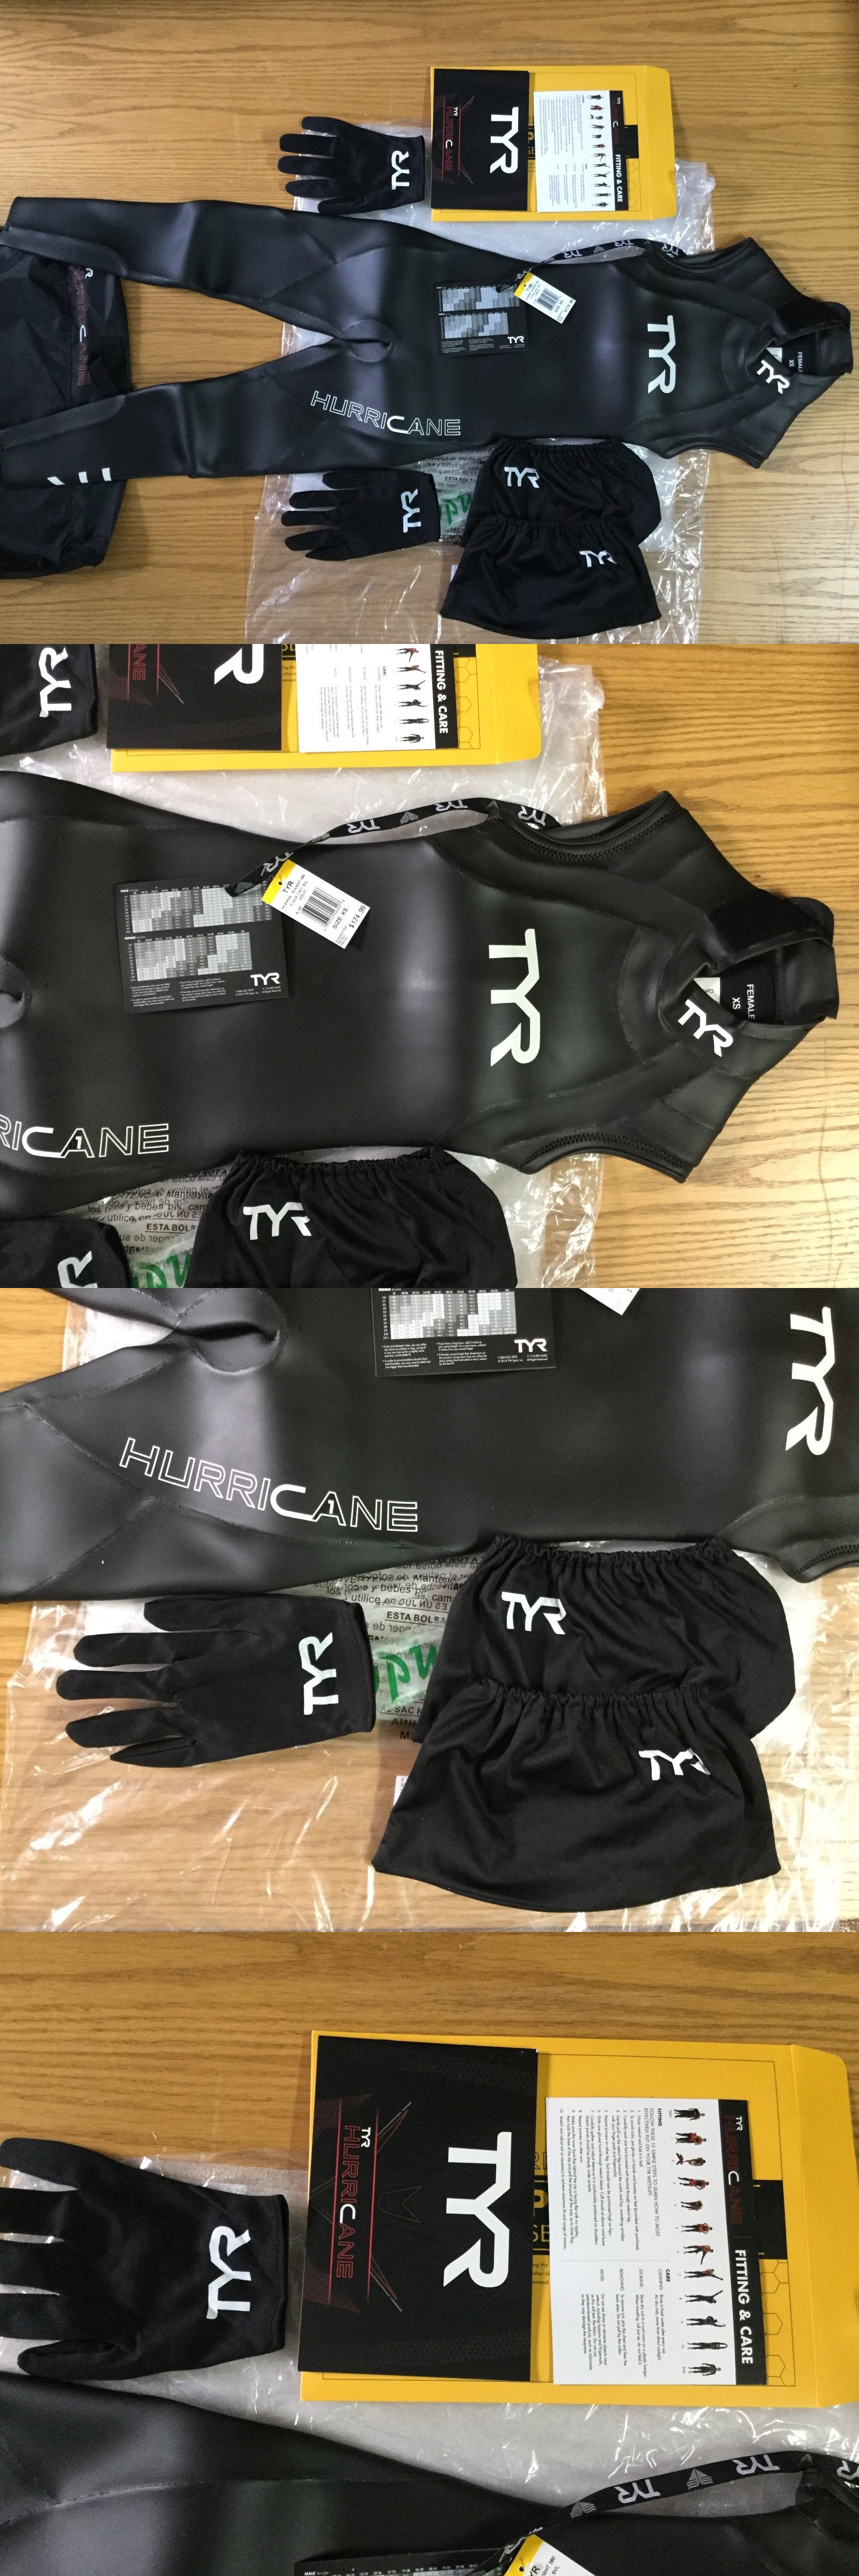 9c4f5b74b4247 Women 47356  Tyr Sport Women Hurricane Sleeveless Wetsuit Category 1 Size  X-Small New